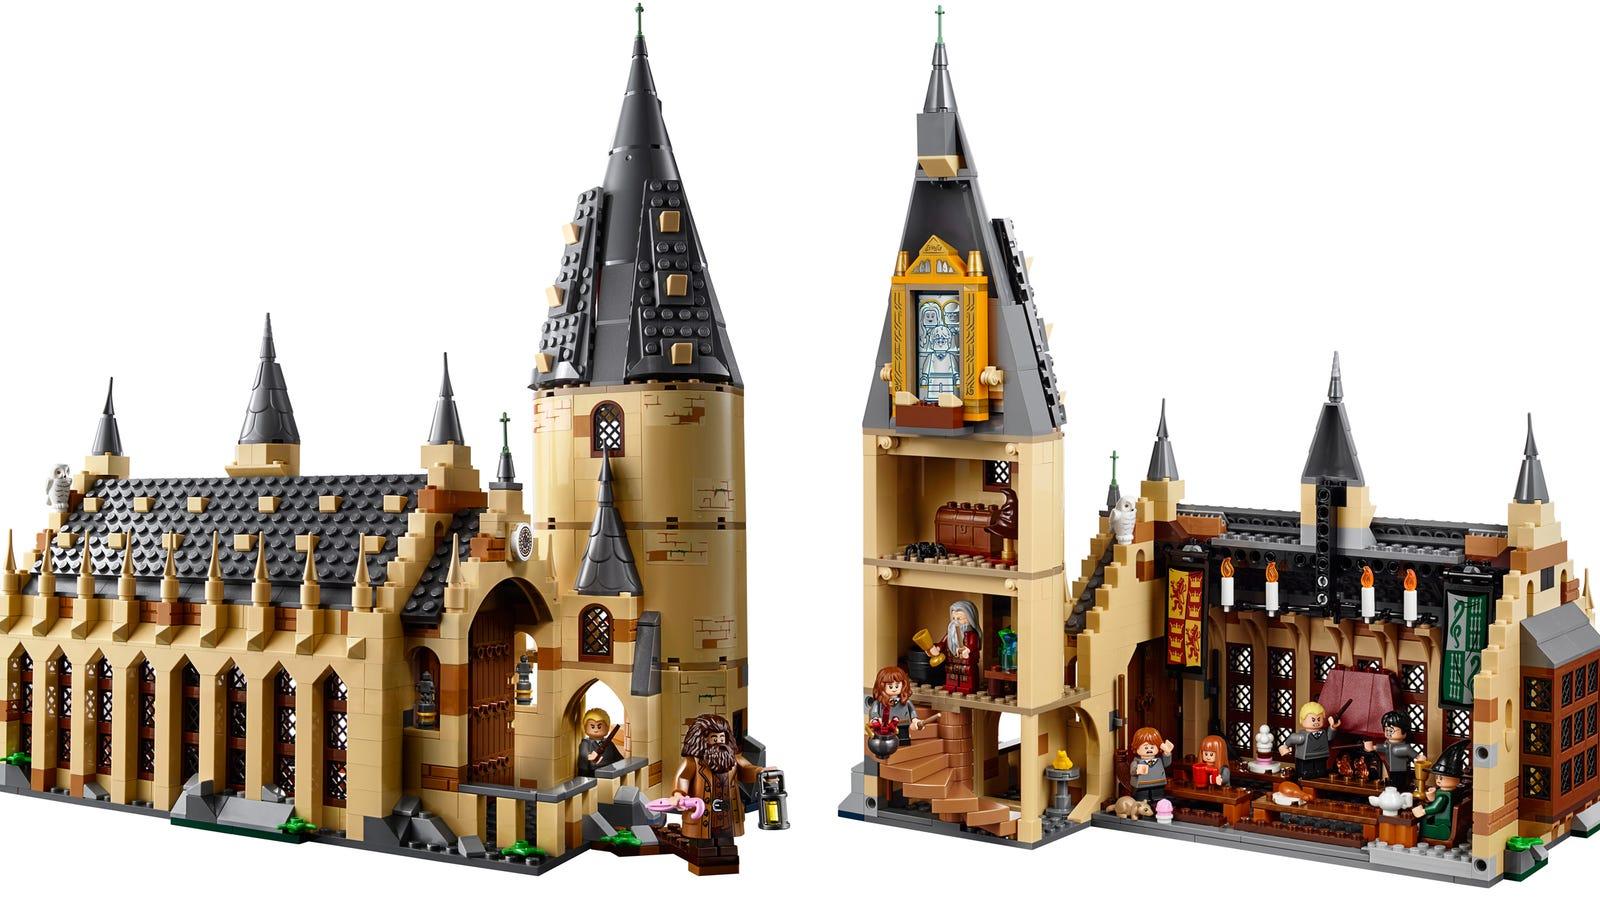 LEGO Harry Potter Diagon Alley review! 2018 set 40289 ... |Harry Potter Impulse Lego Sets